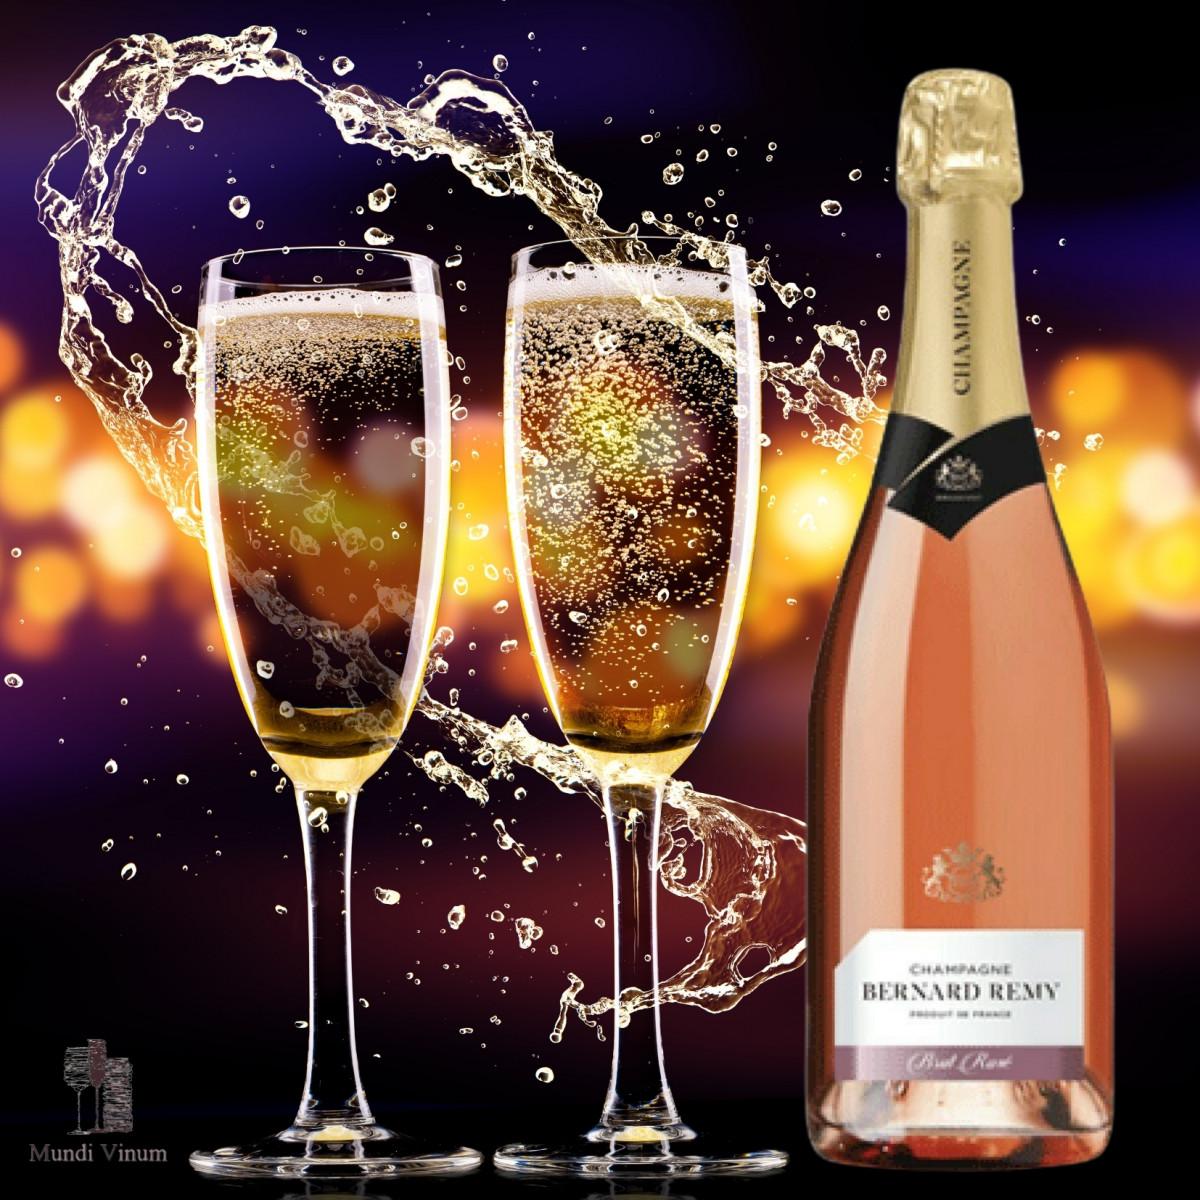 Champagne Bernard Remy Brut